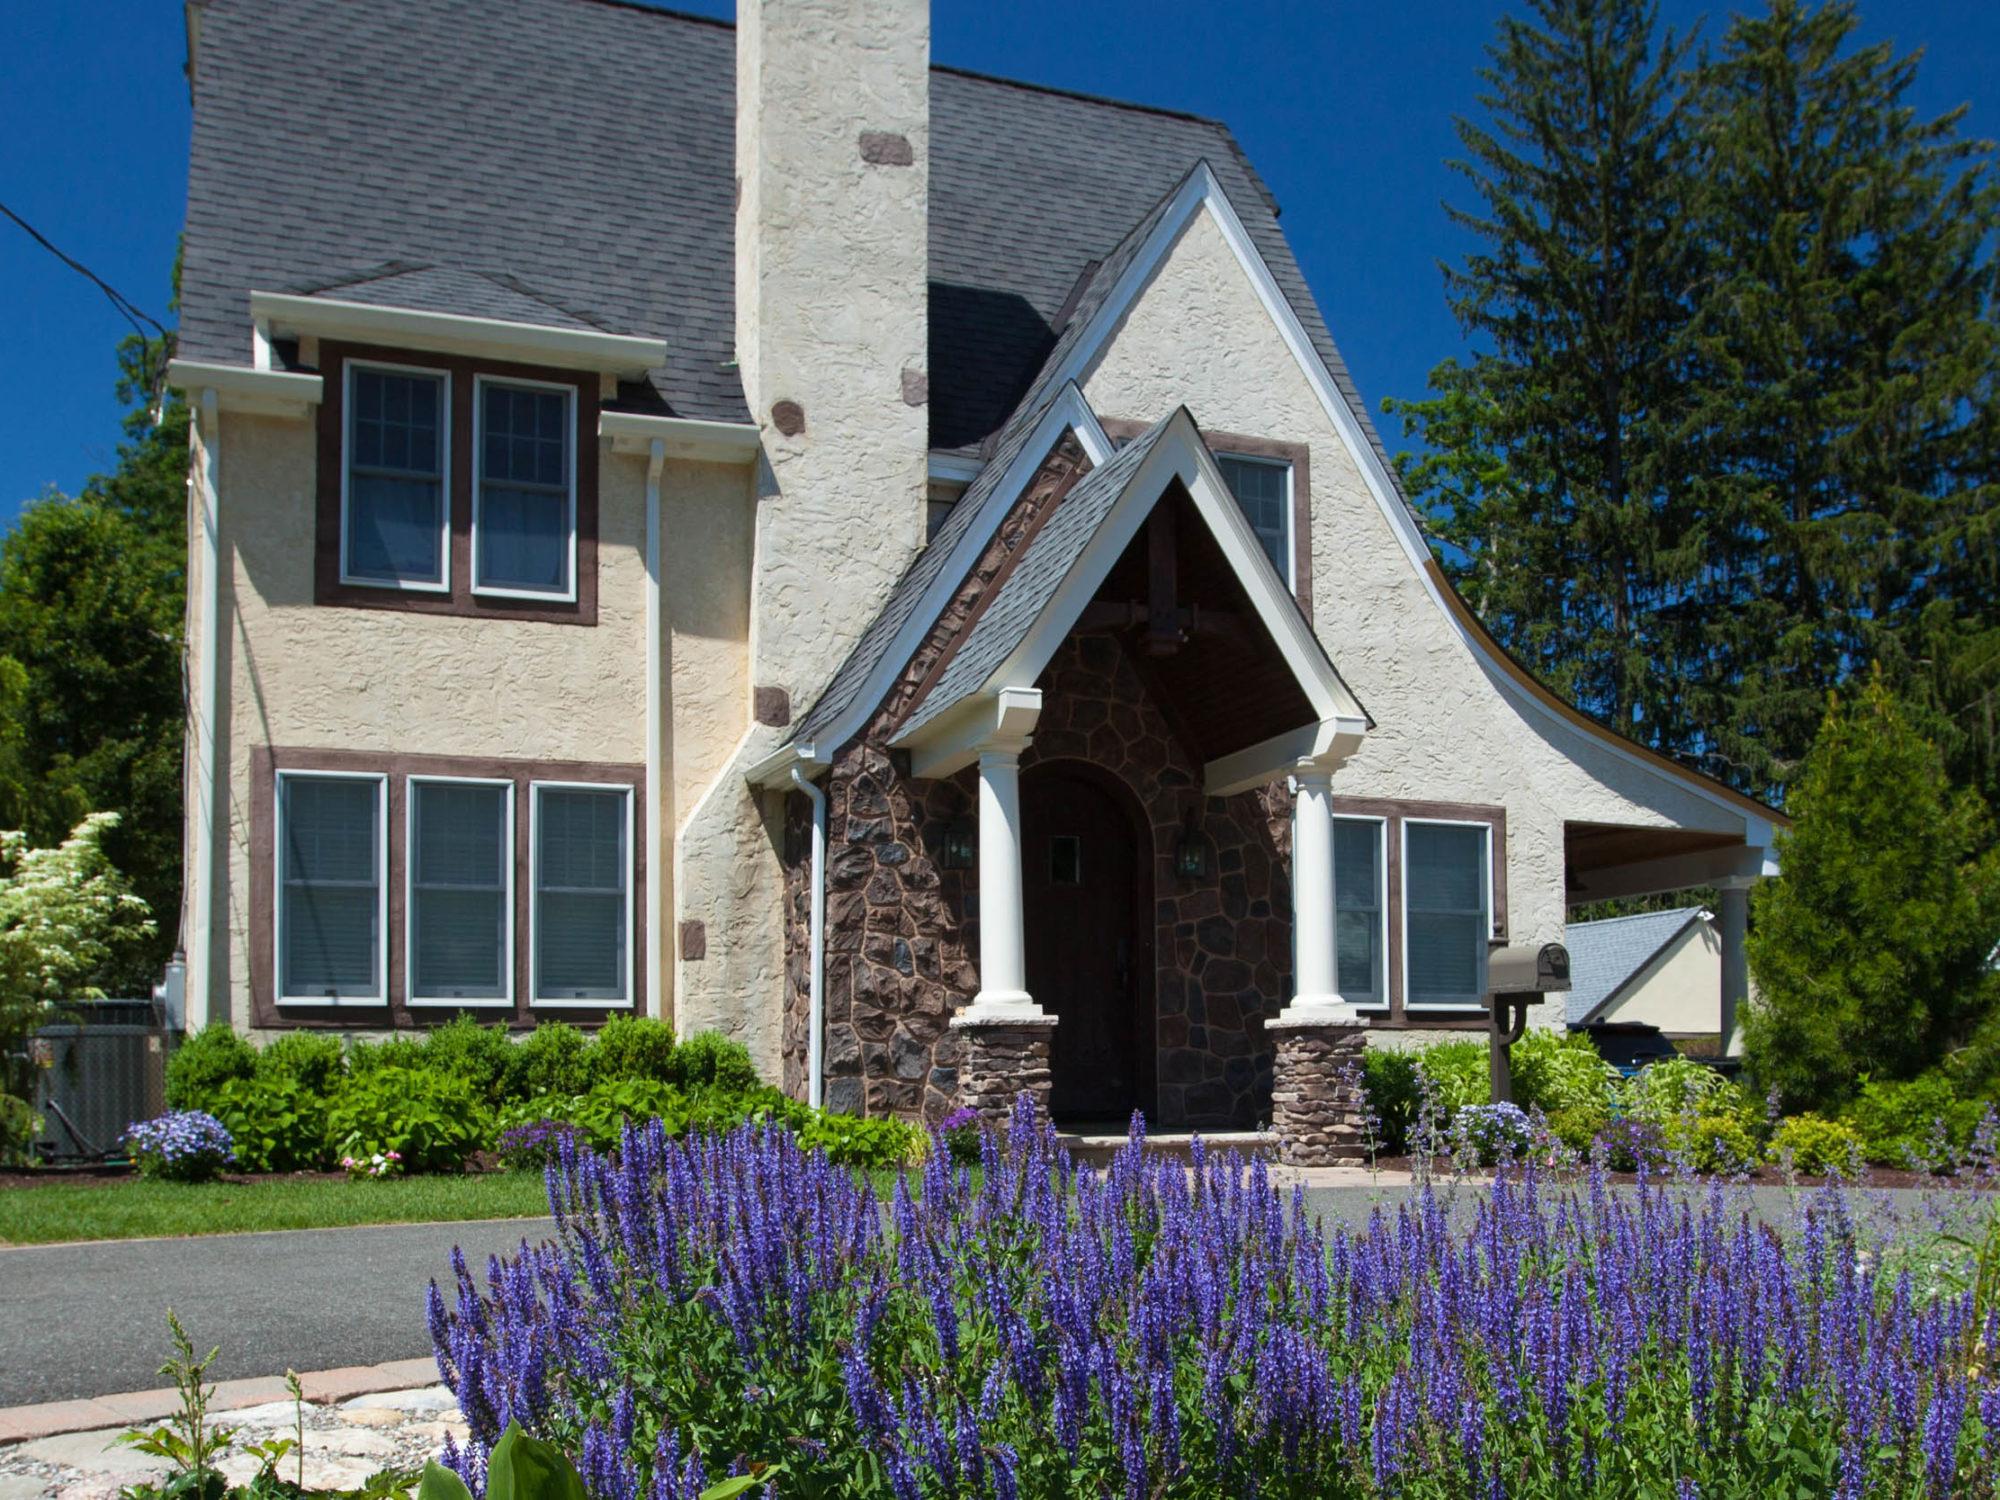 Residential Landscape Design Services by Above Par